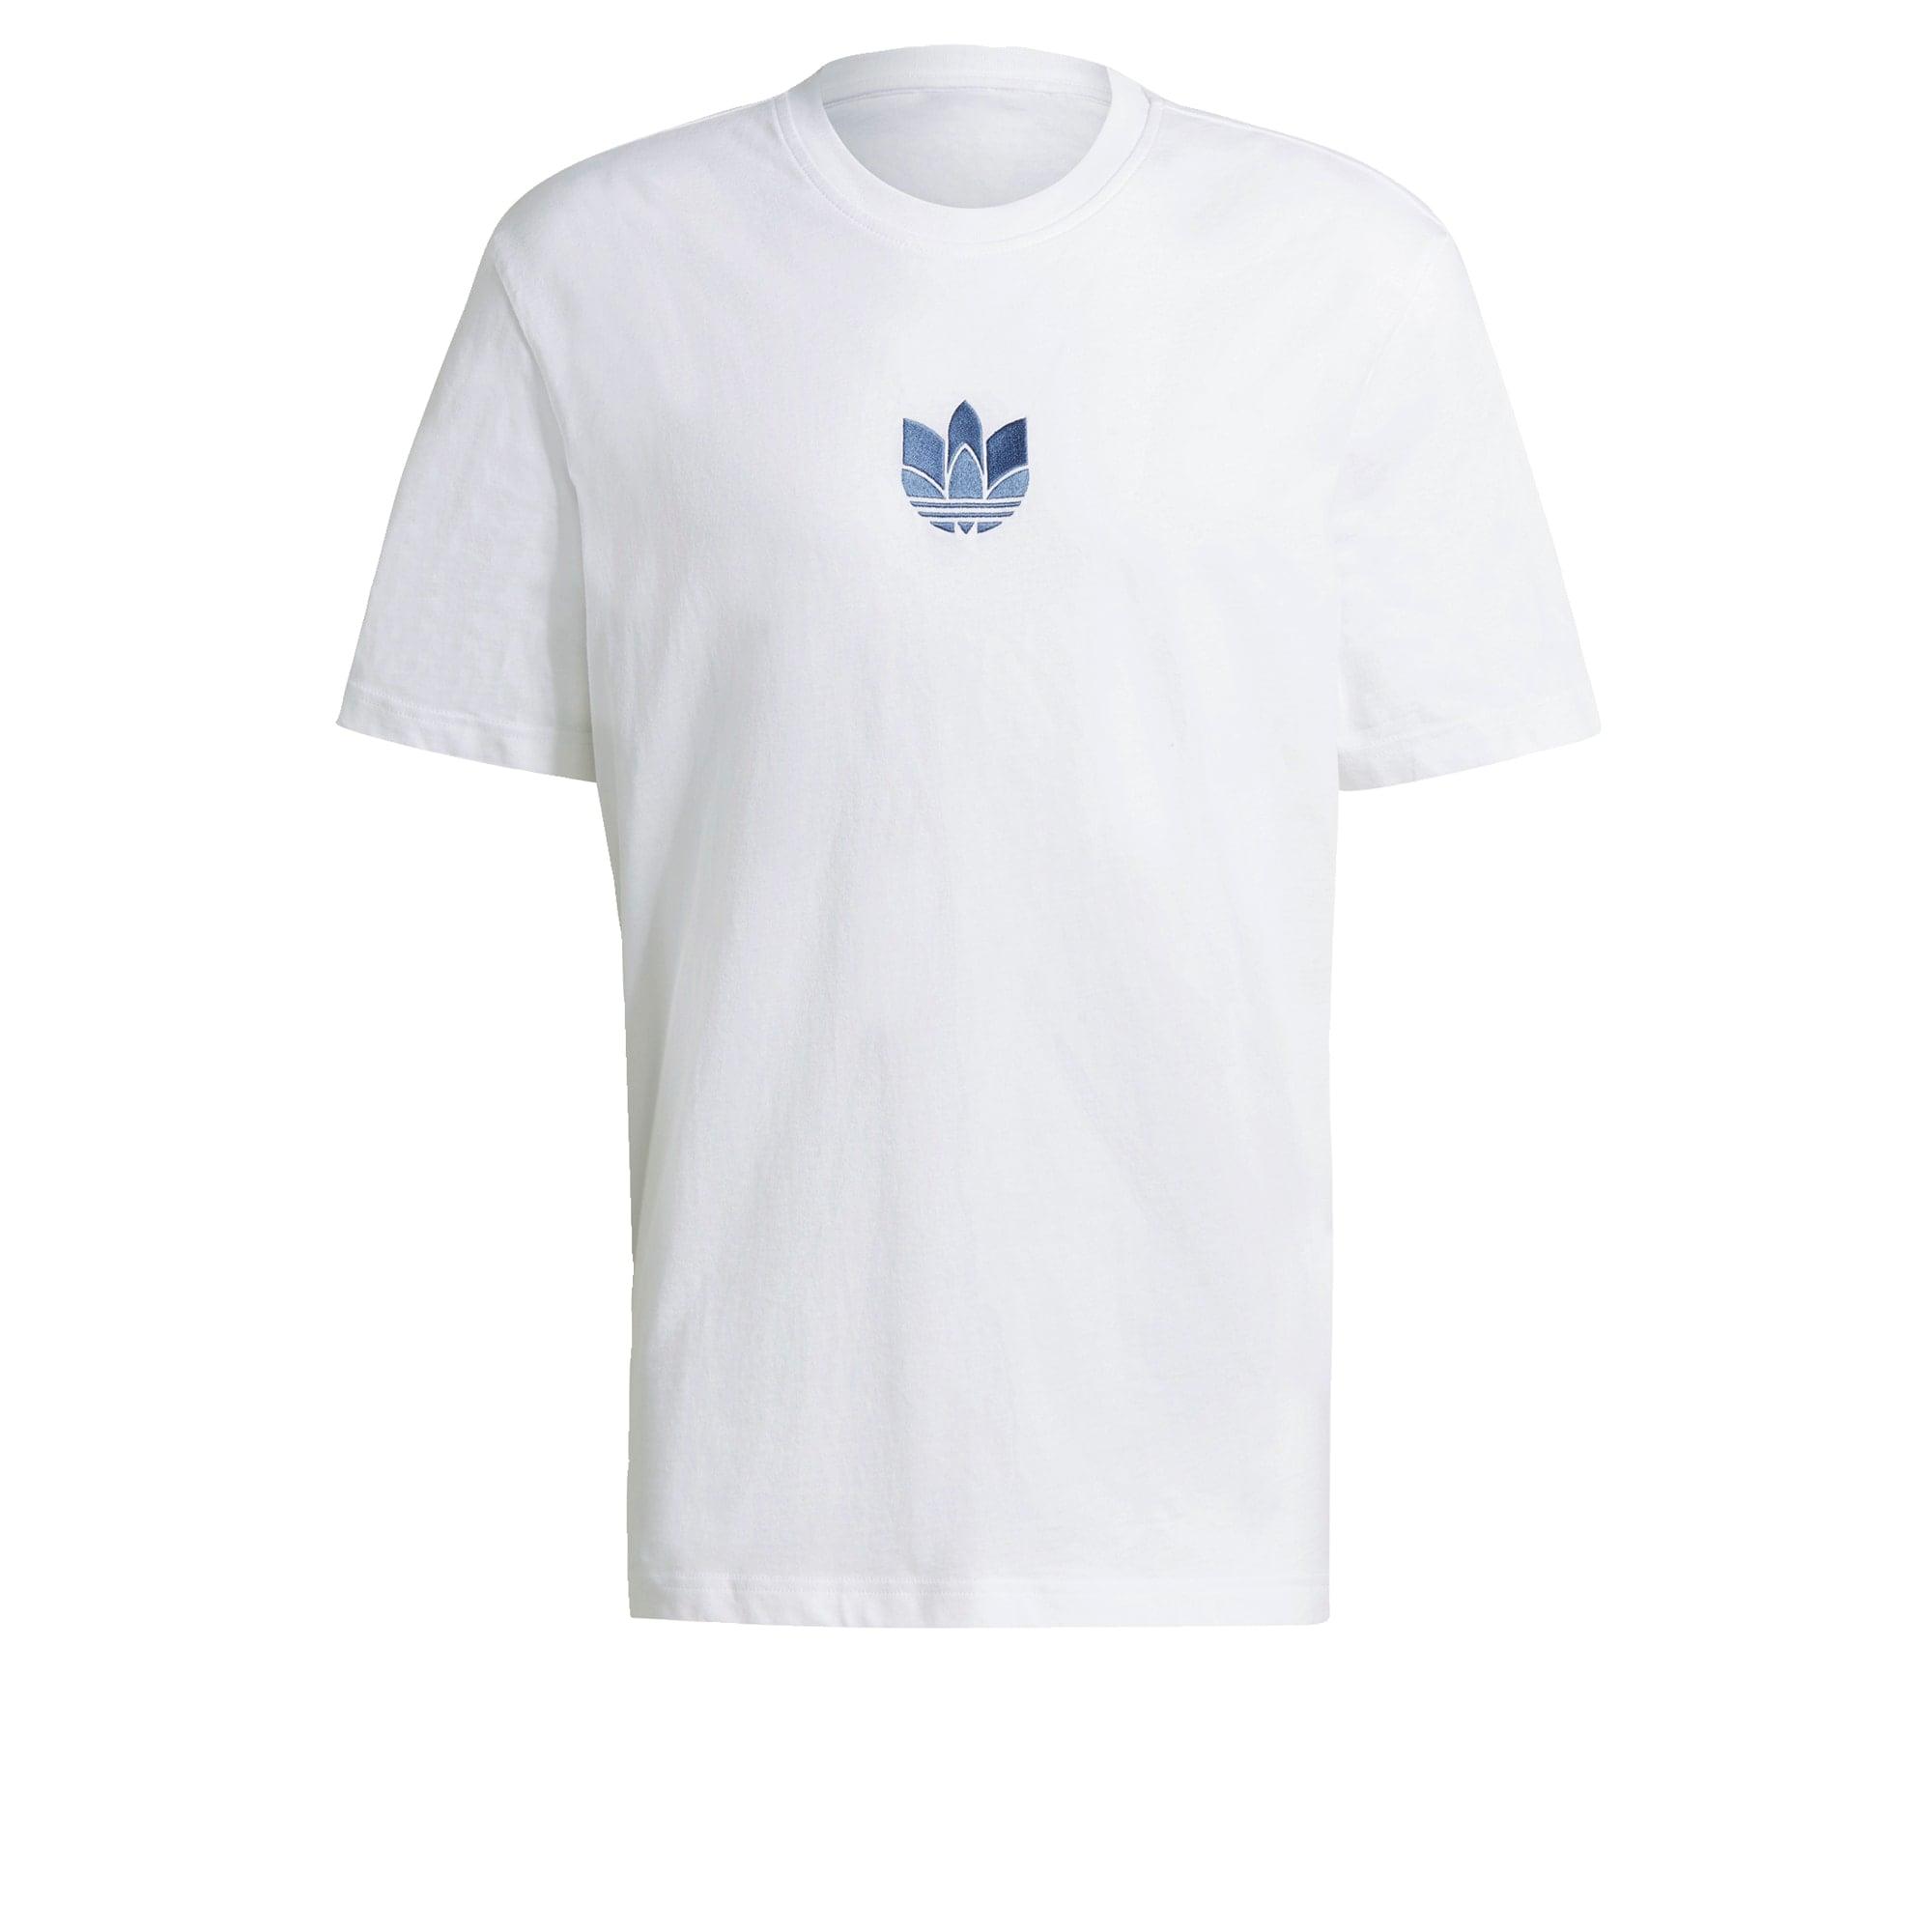 ADIDAS ORIGINALS Marškinėliai 'Adicolor 3D Trefoil' balta / mėlyna